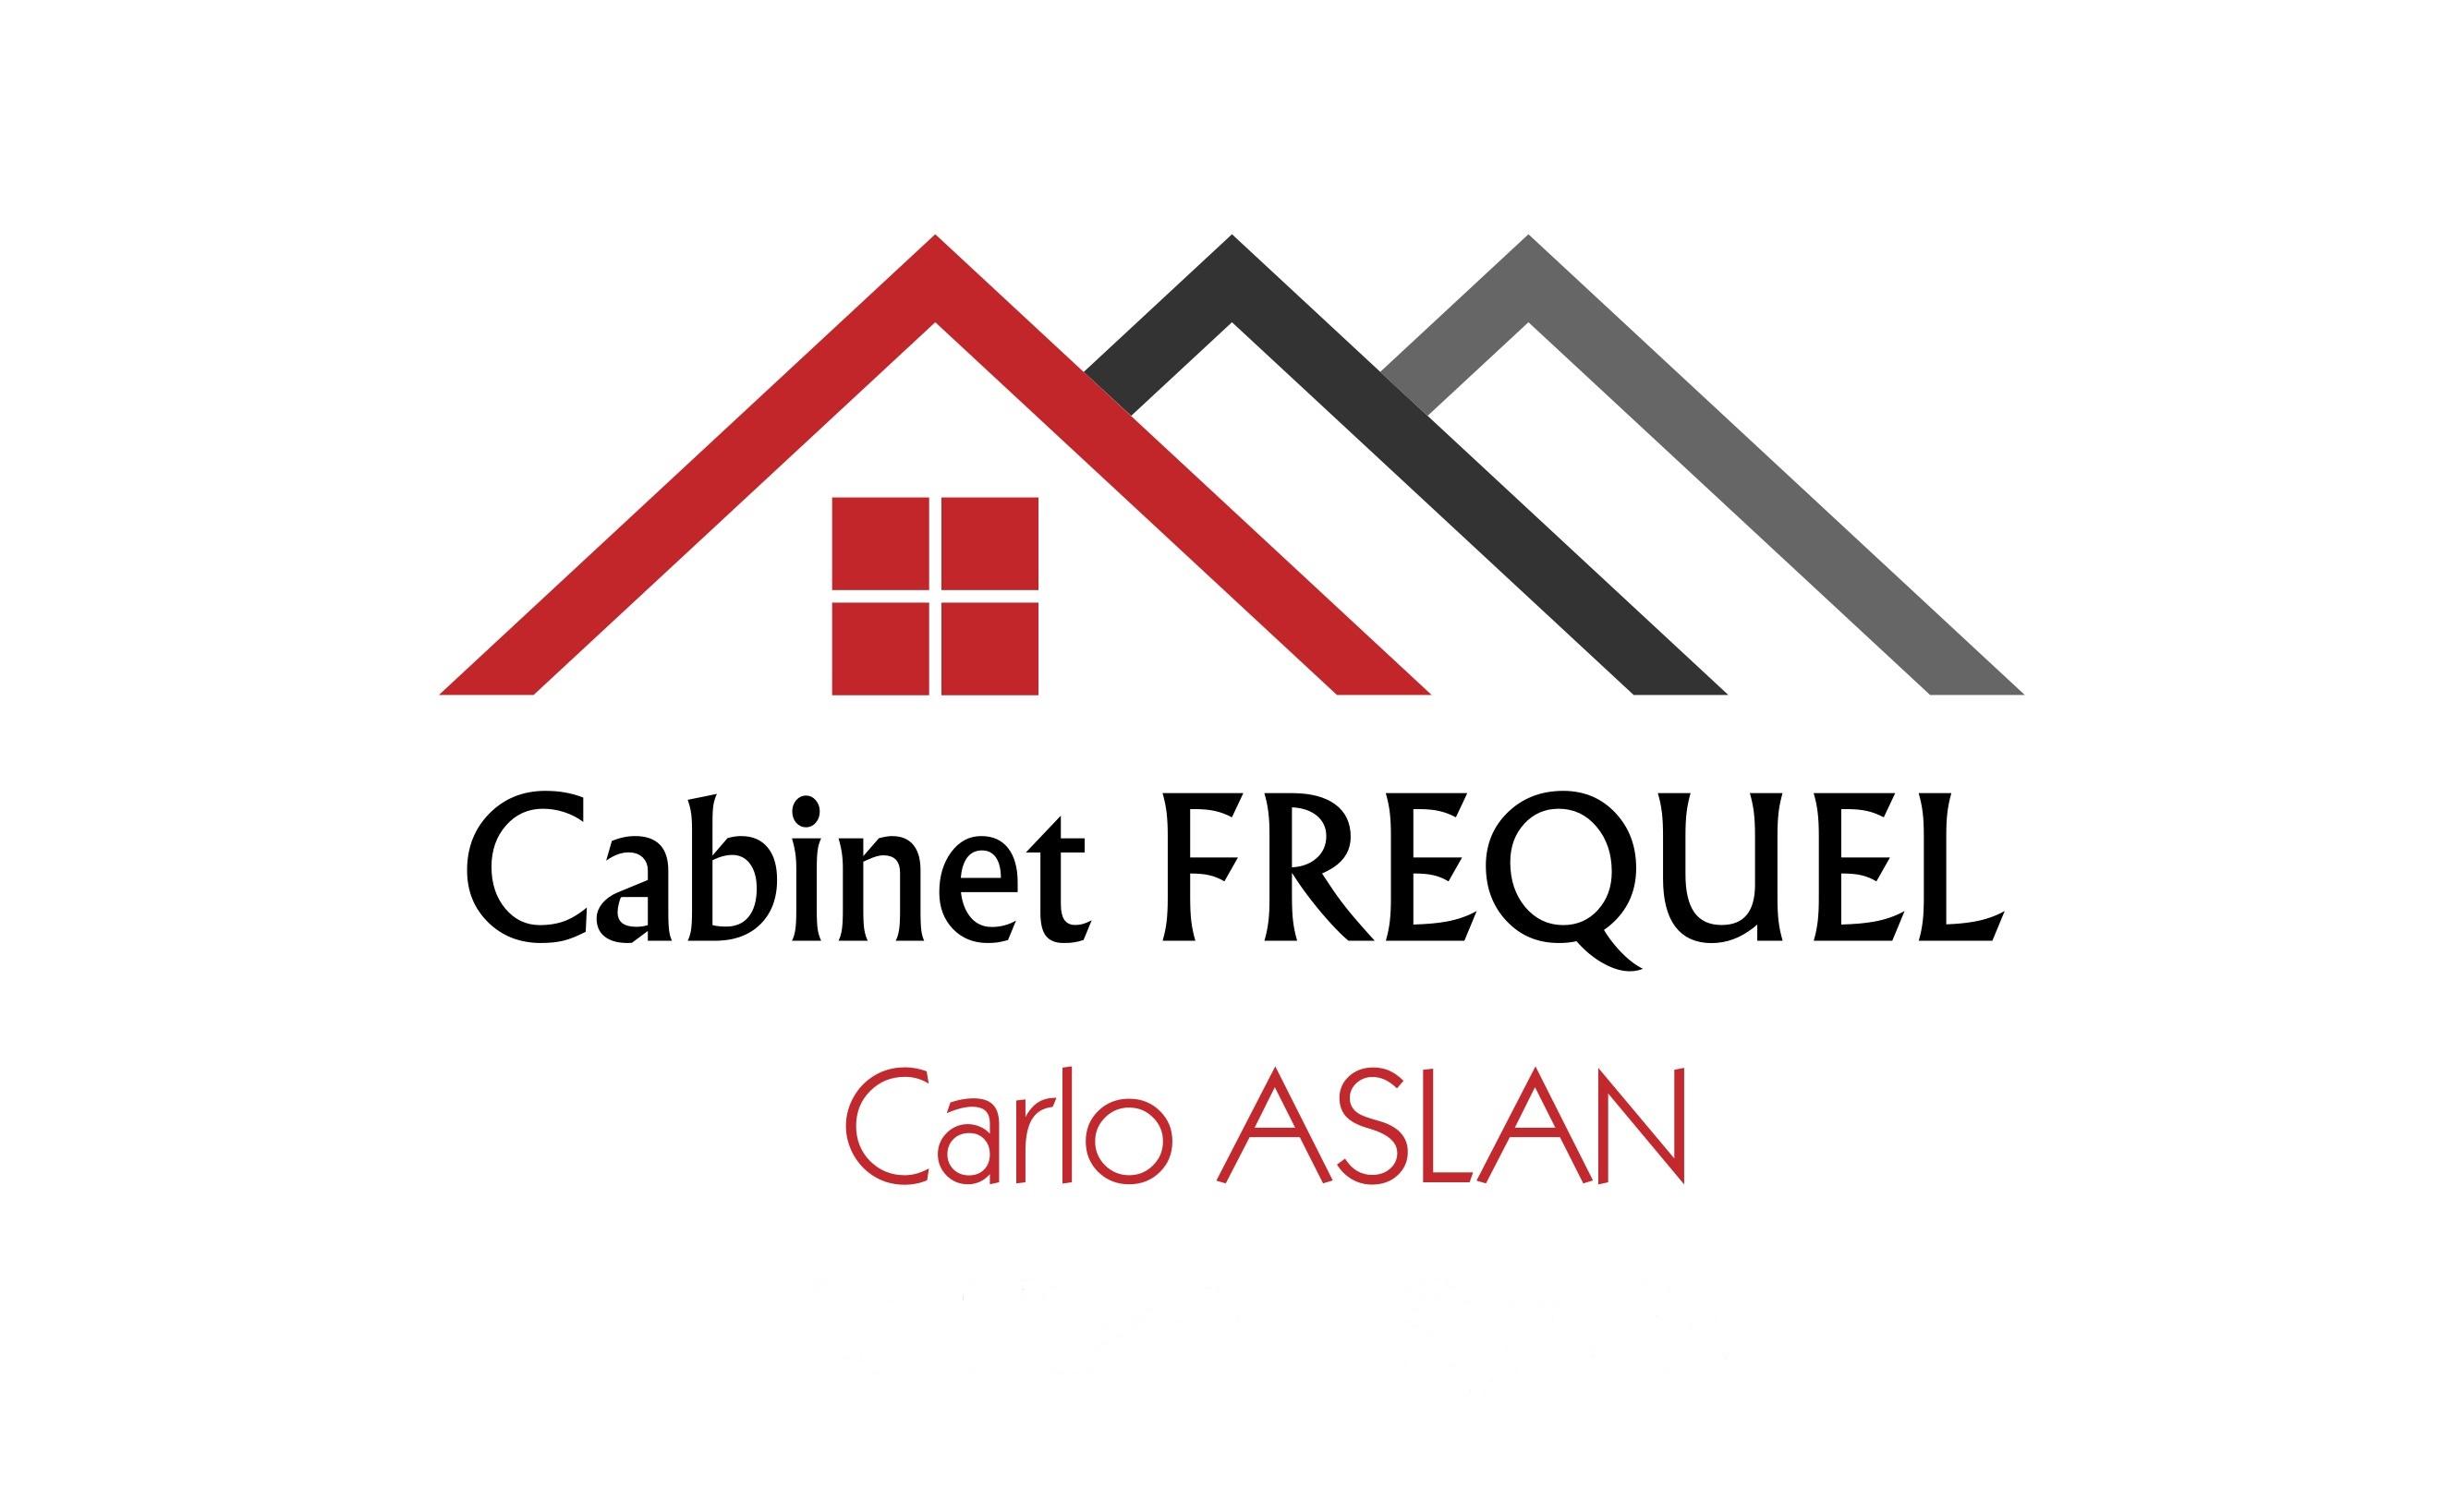 Cabinet FREQUEL - Carlo ASLAN